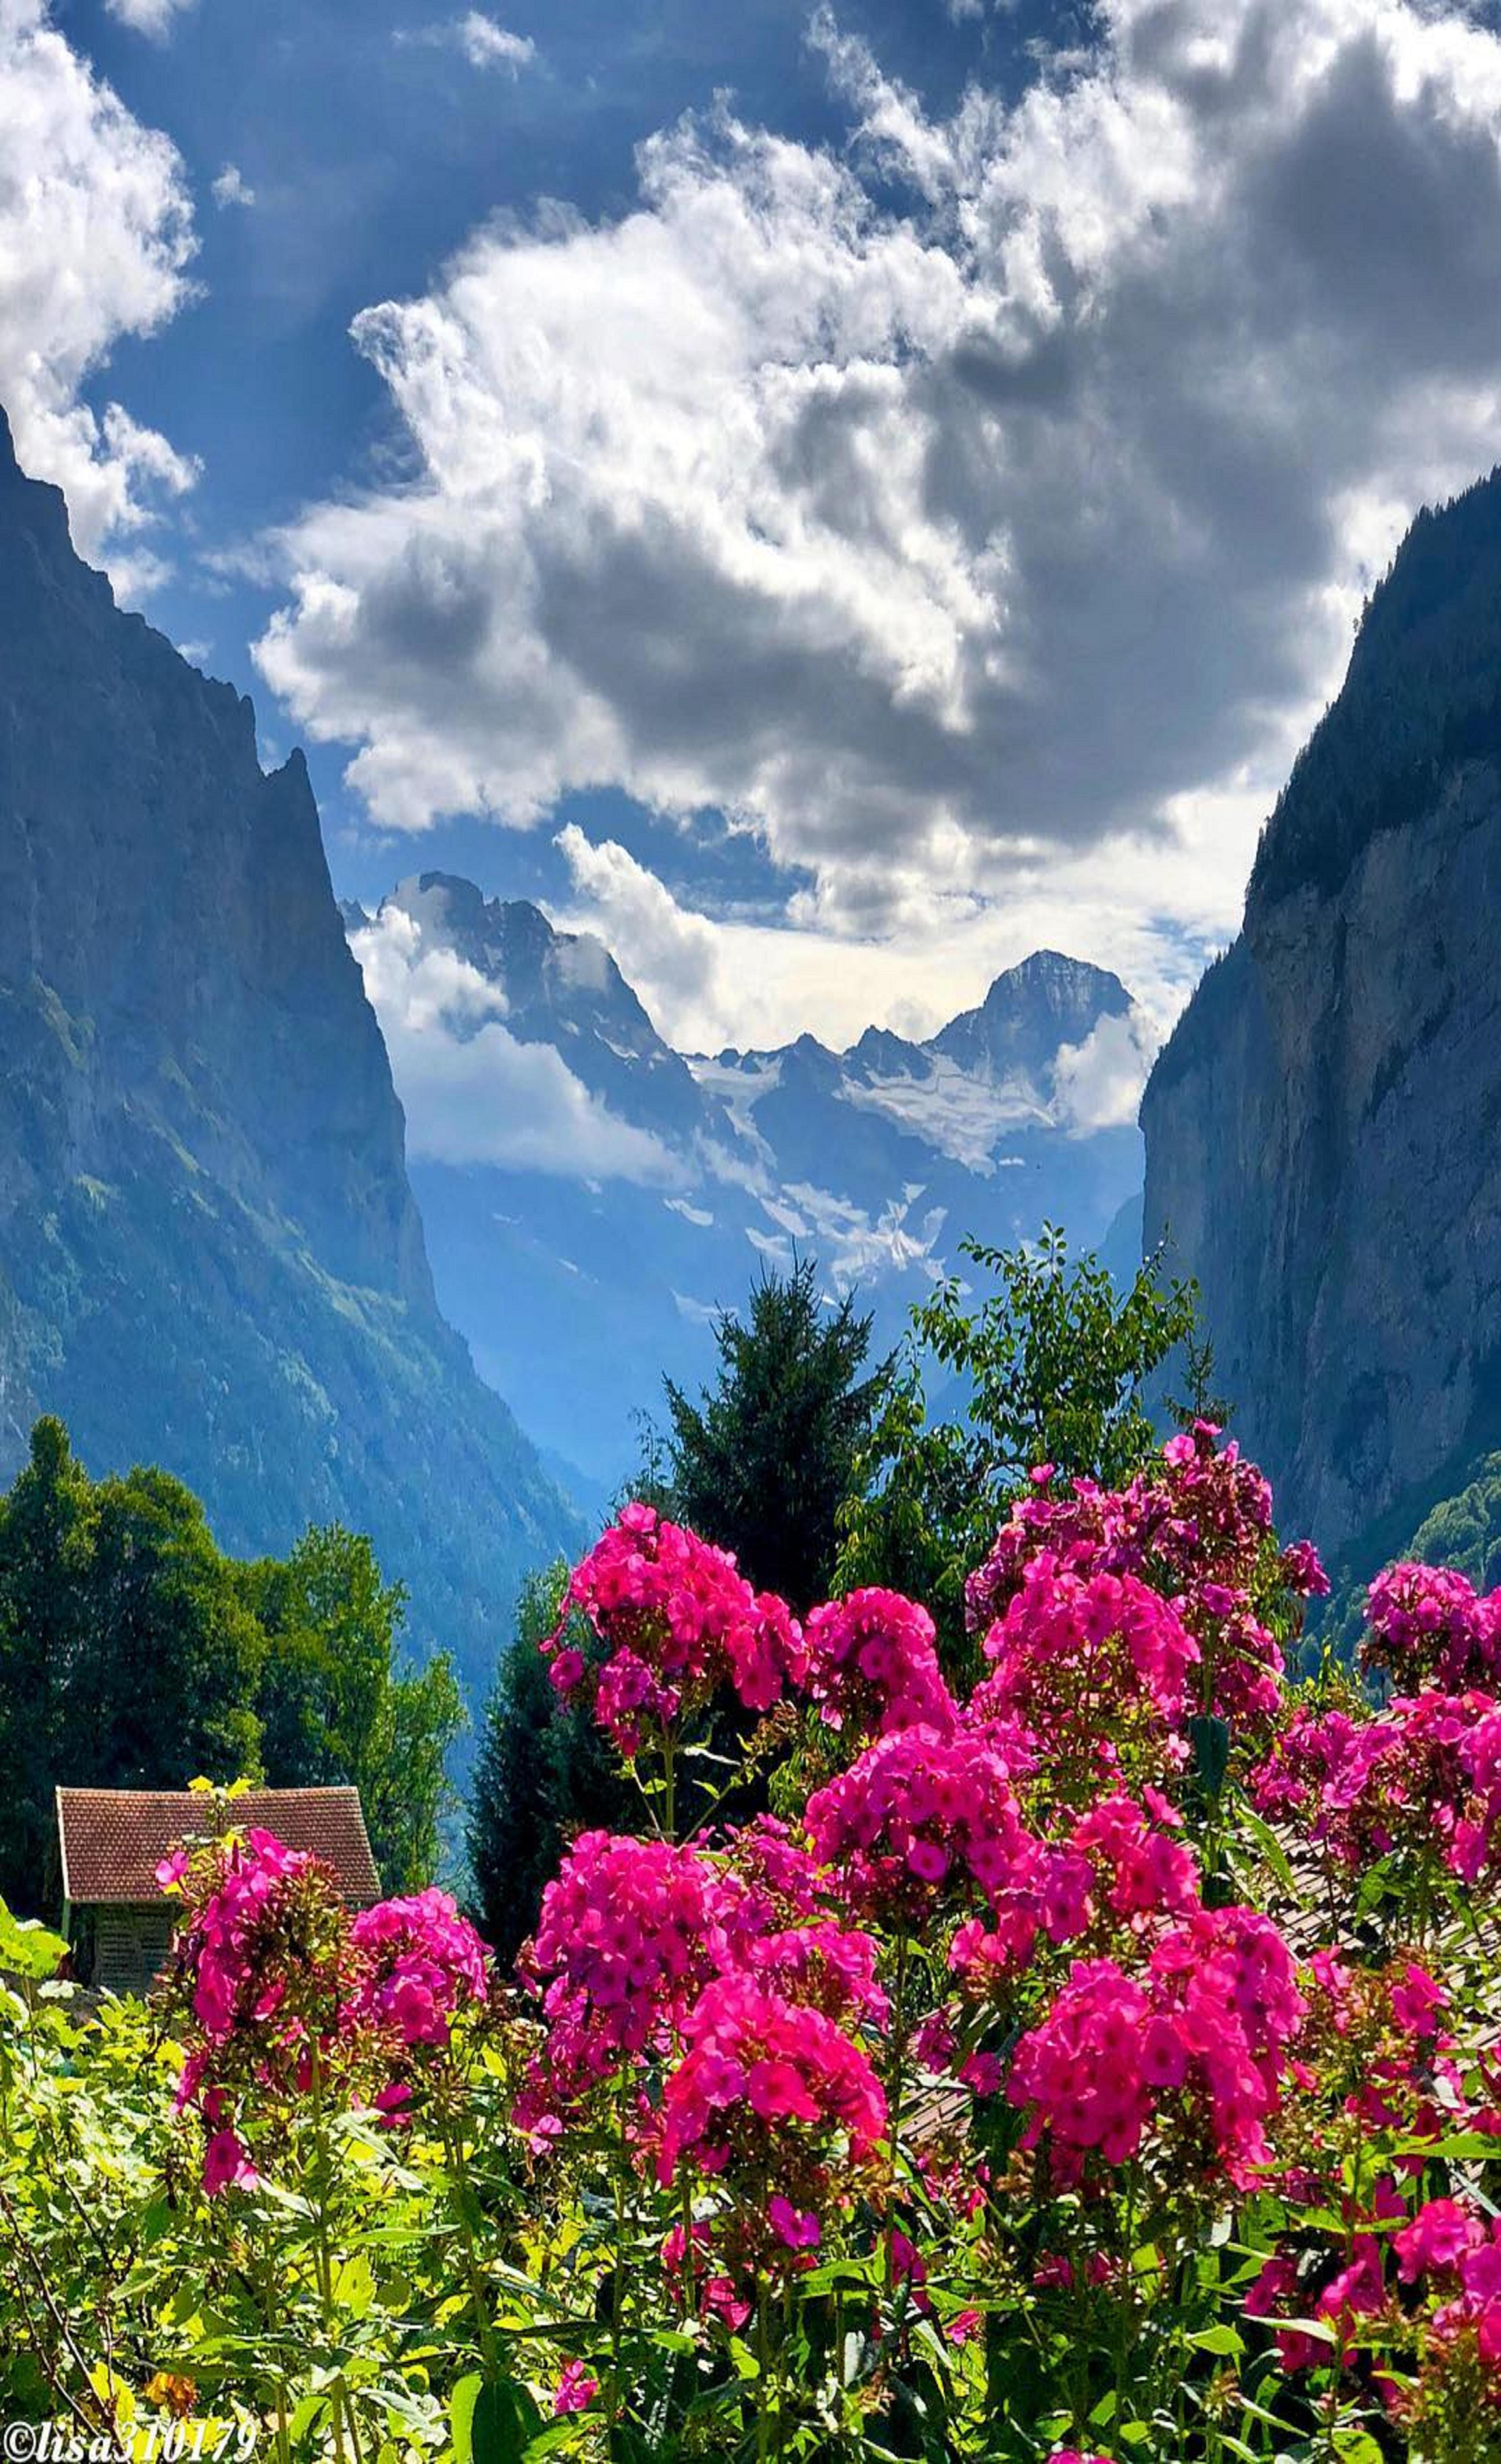 Lauterbrunnen Beautiful Nature Best Nature Images Beautiful Landscapes